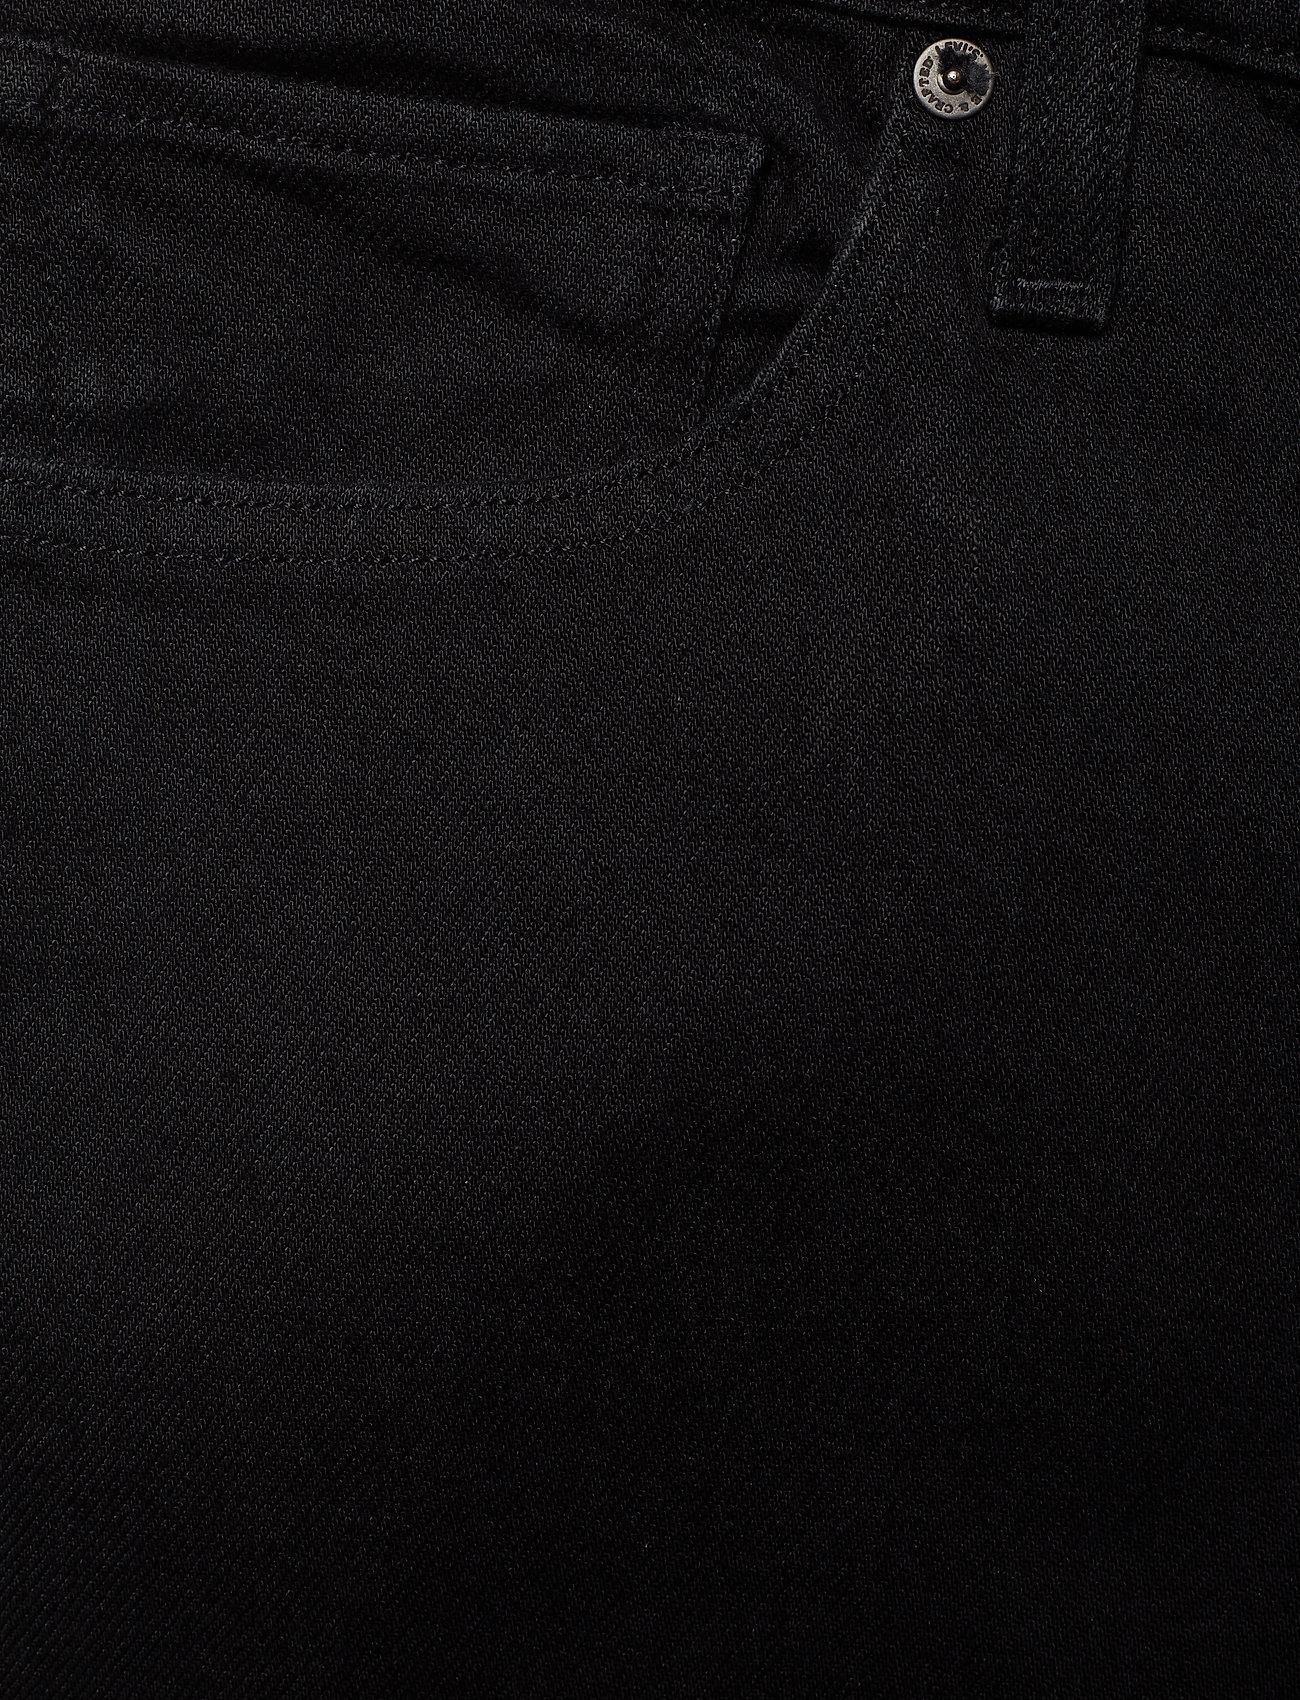 Levi's Made & Crafted - LMC 511 LMC BLACK RINSE 1 - slim jeans - blacks - 2